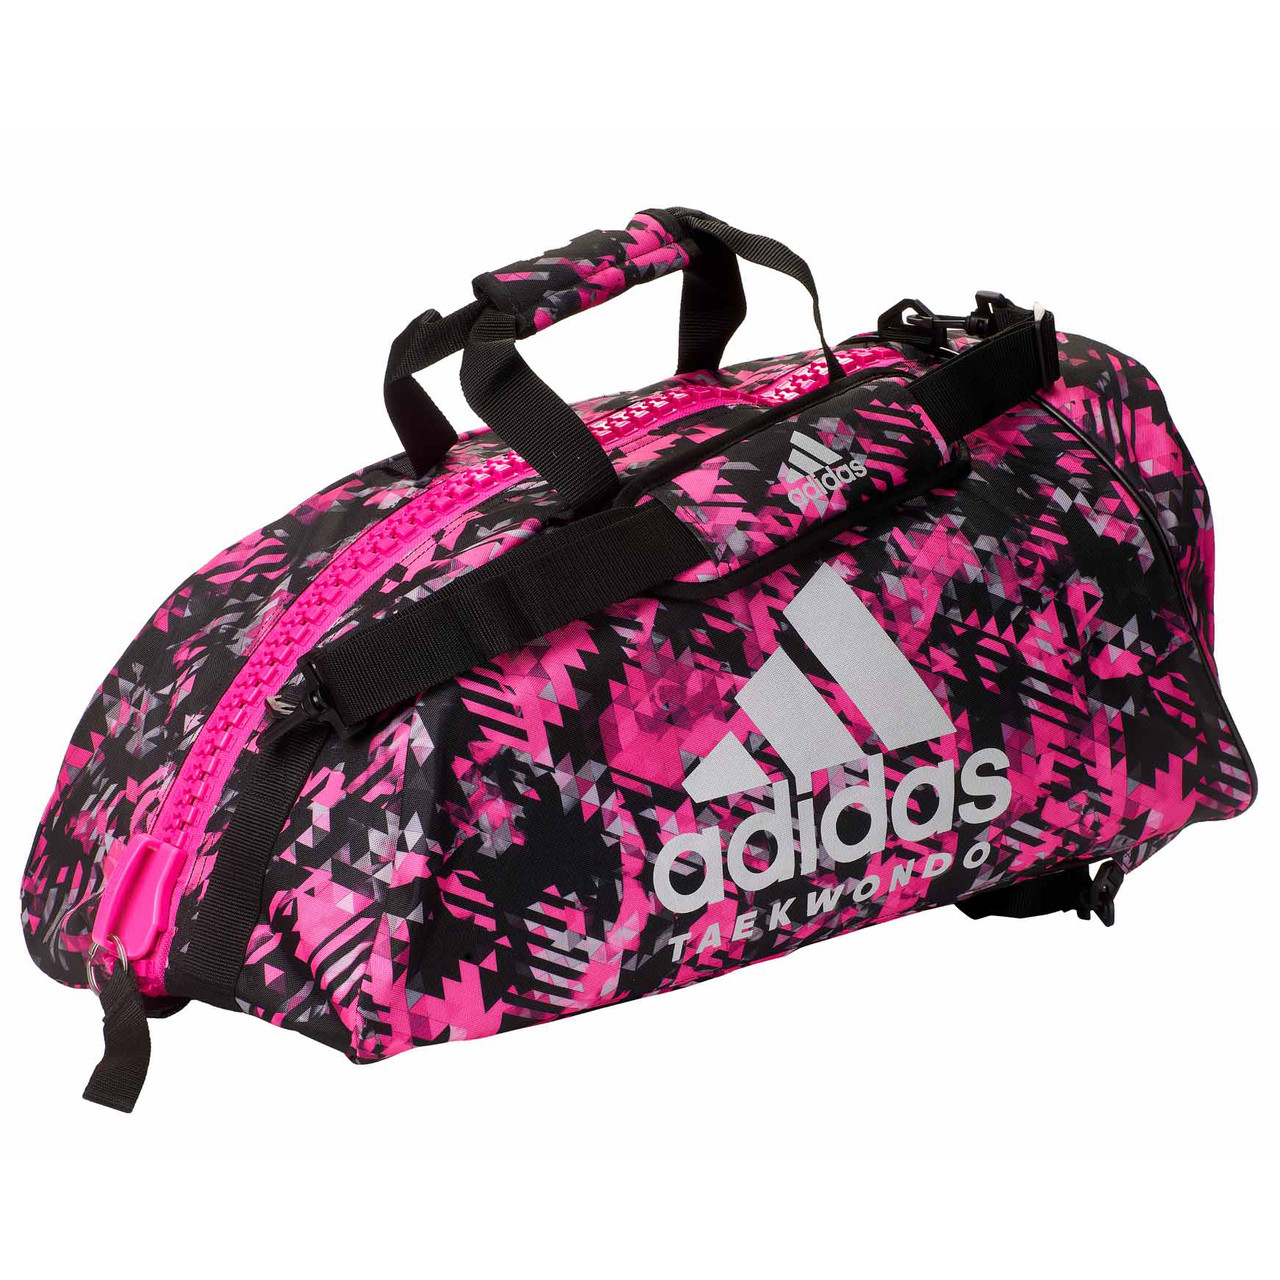 "Сумка-рюкзак Adidas 2in1 Bag ""Taekwondo"" Nylon, adiACC052 Розовая"